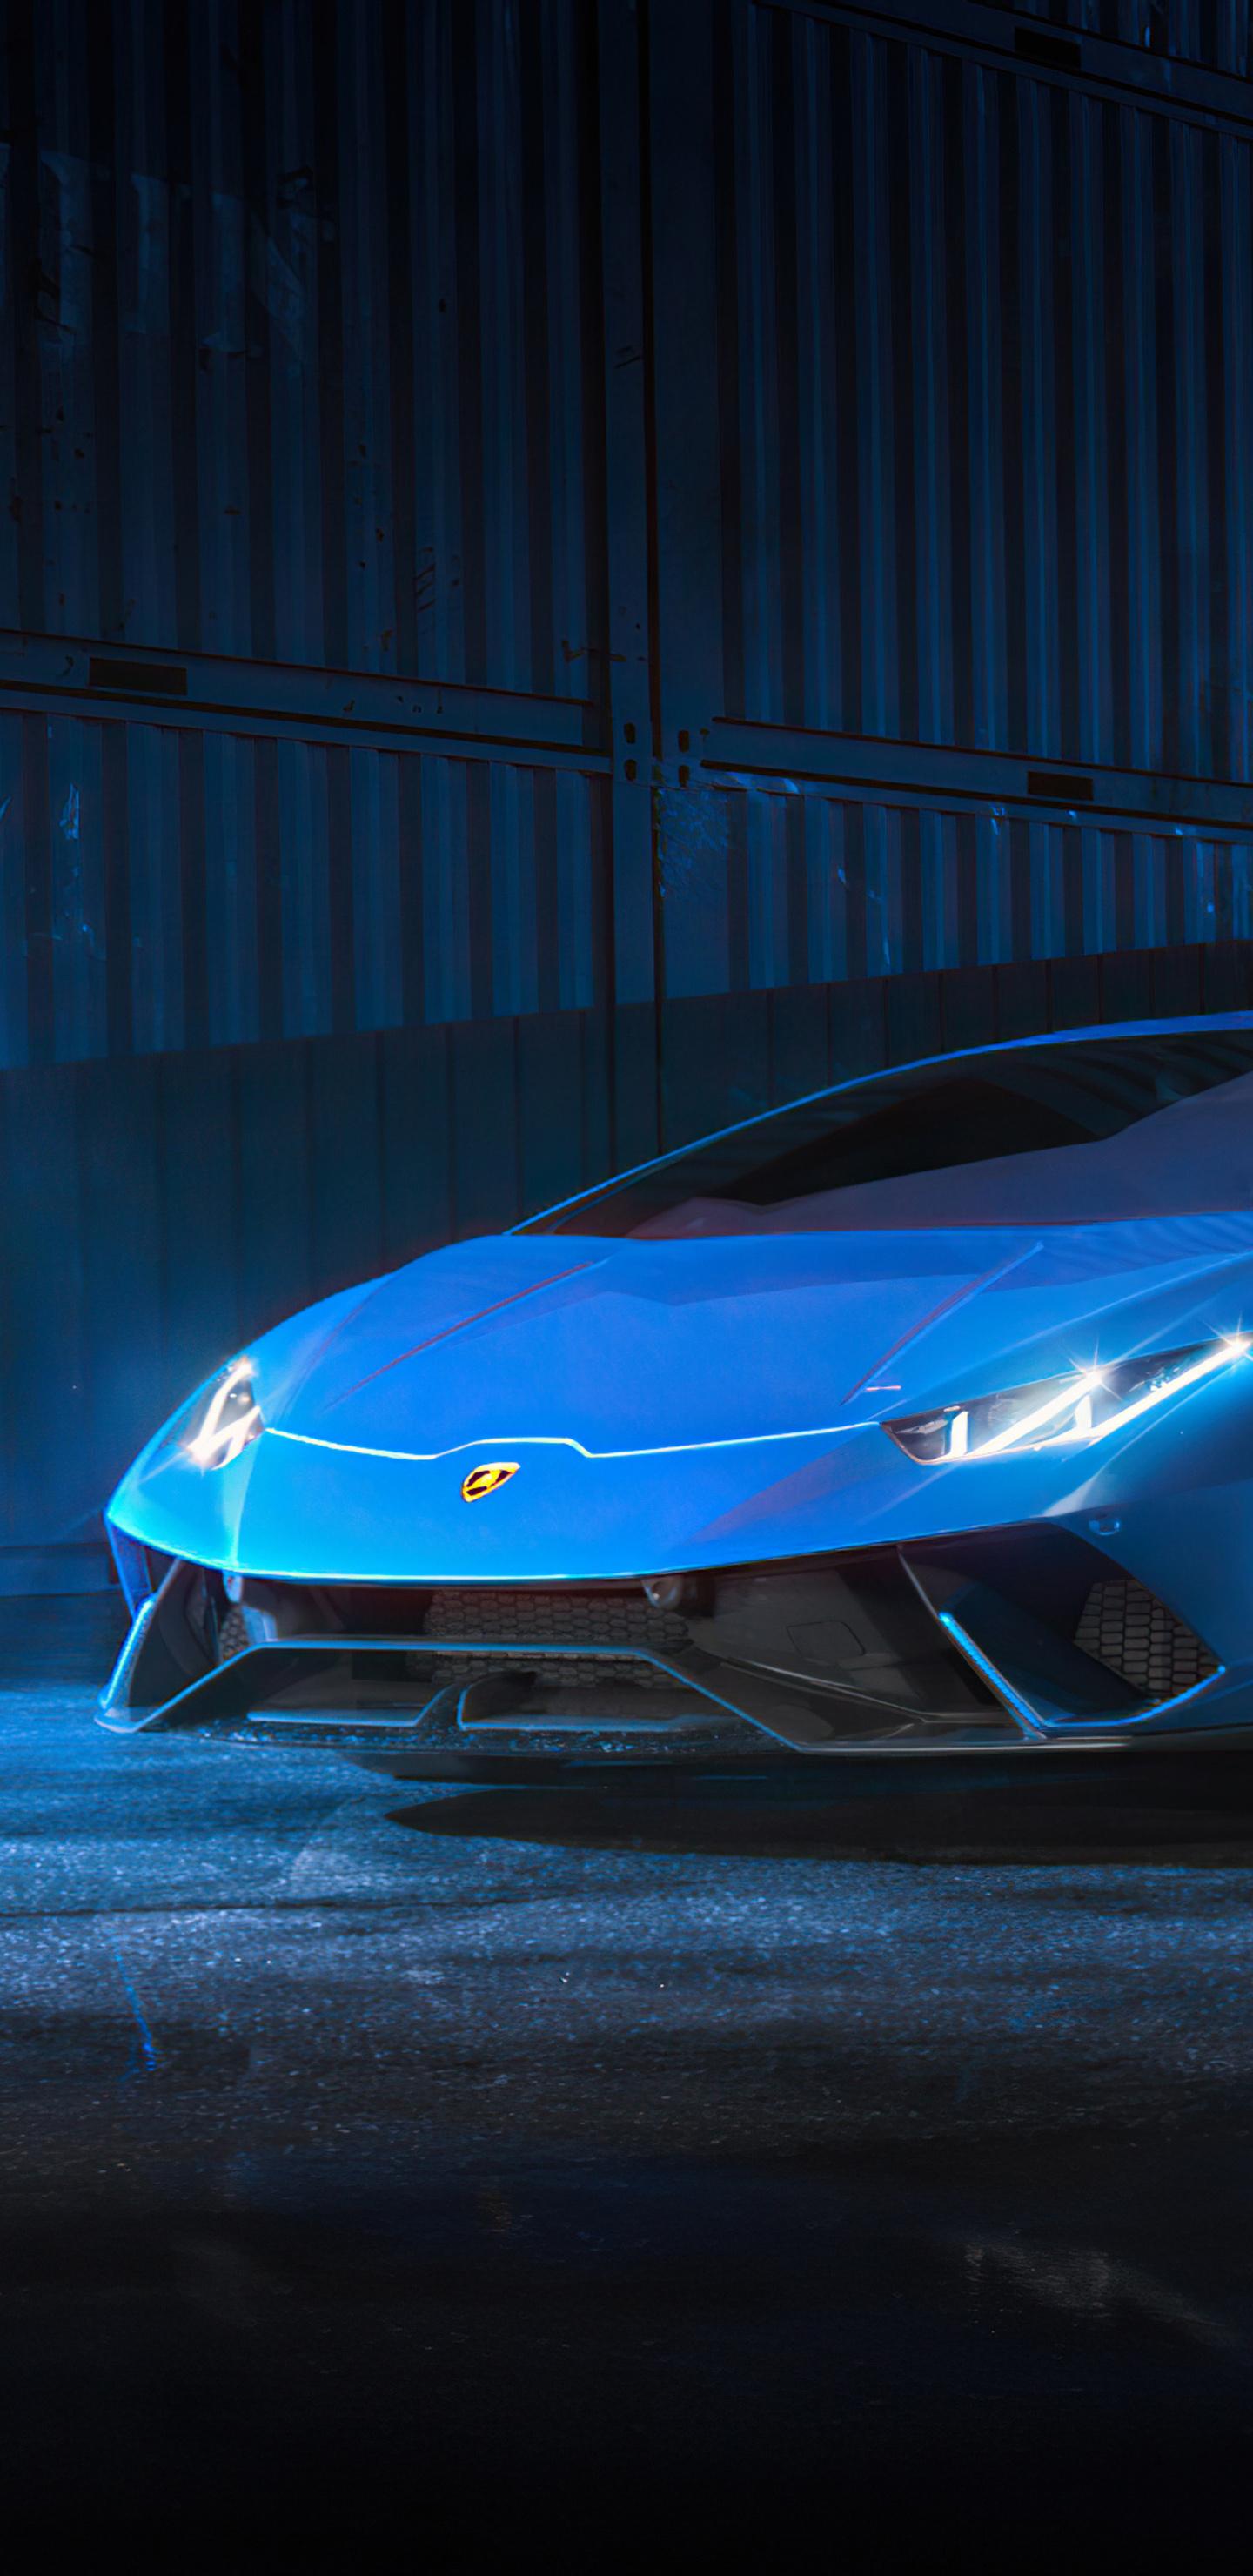 1440x2960 Blue Lamborghini Huracan 4k Samsung Galaxy Note ...